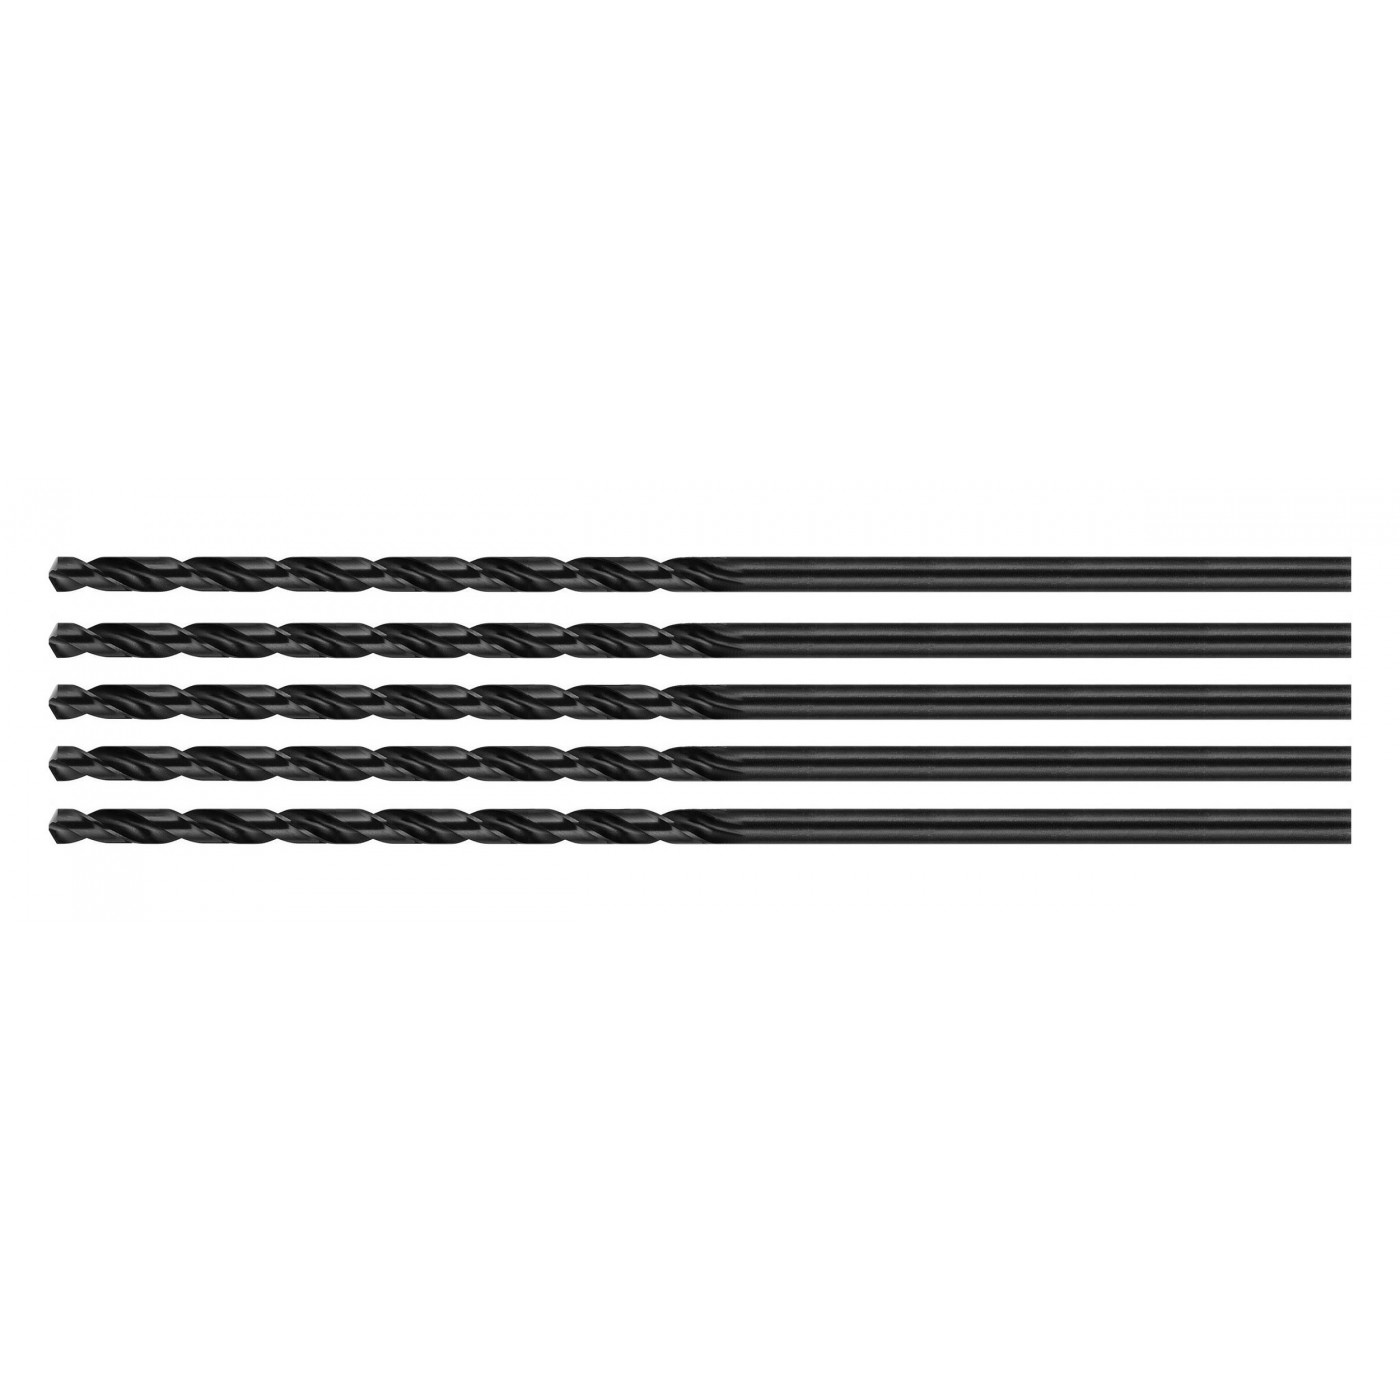 Set of 5 metal drill bits, extra long (5.0x300 mm)